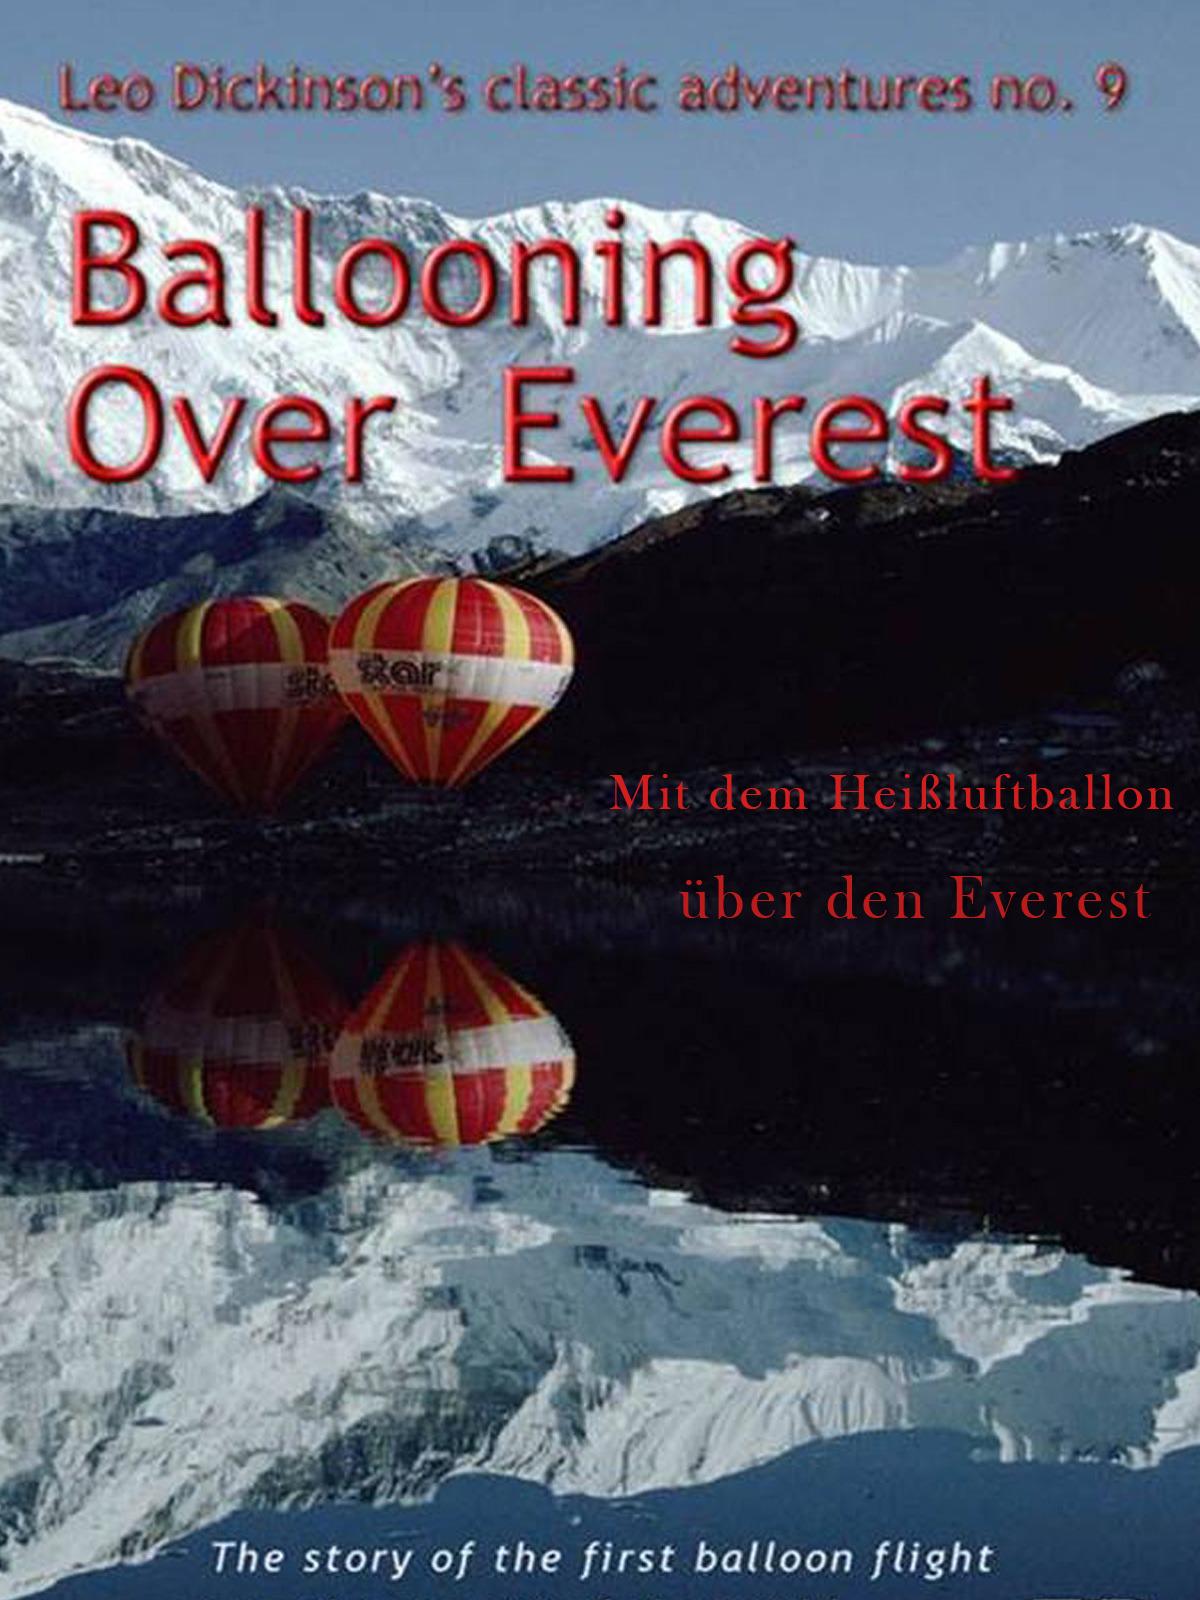 Balloning Everest- Erste Fahrt mit dem Heißluftballon über den Everest